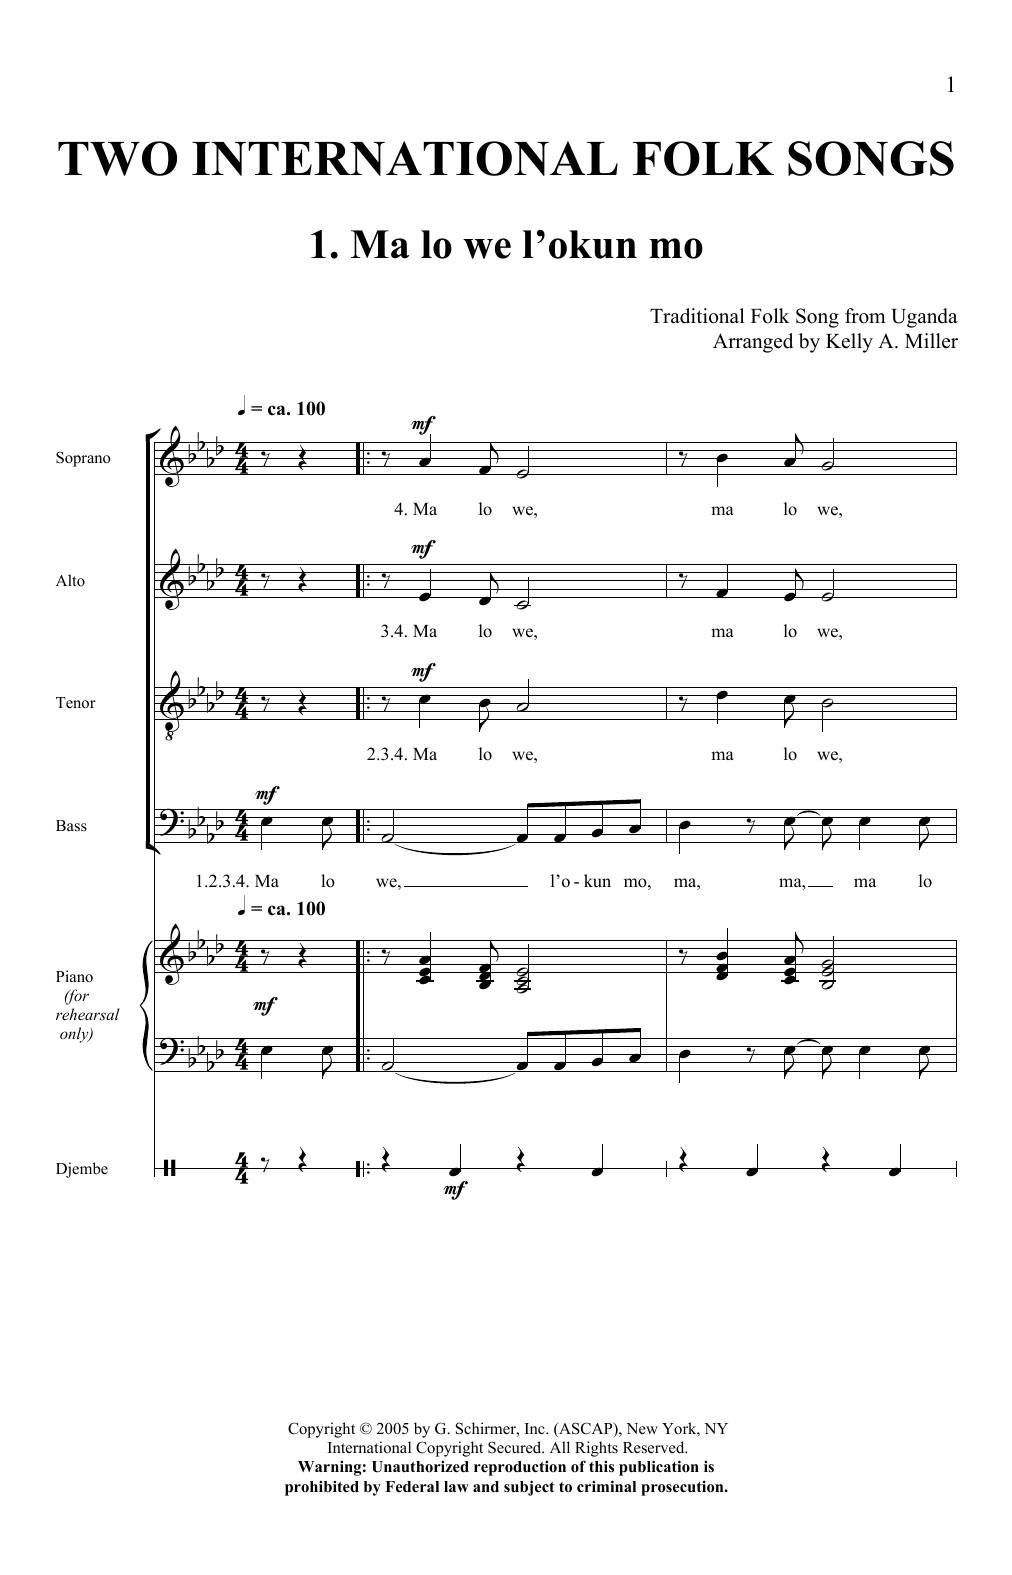 Two International Folk Songs